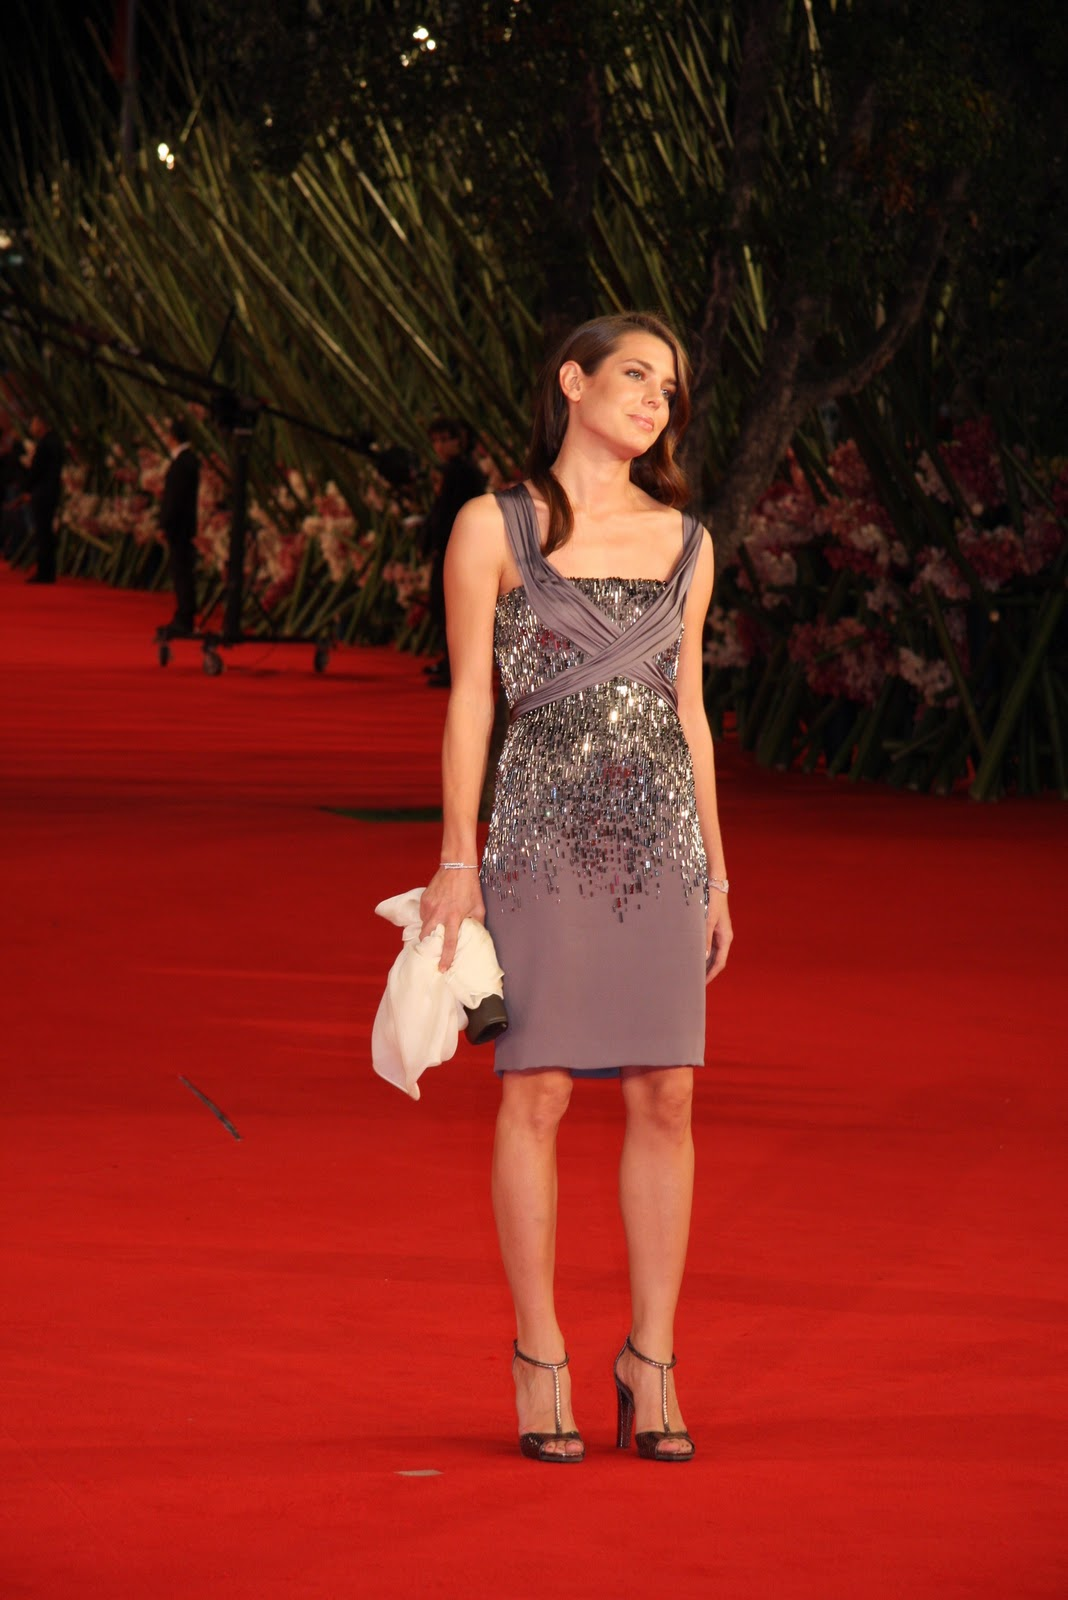 Vittoria Belvedere (born 1972)